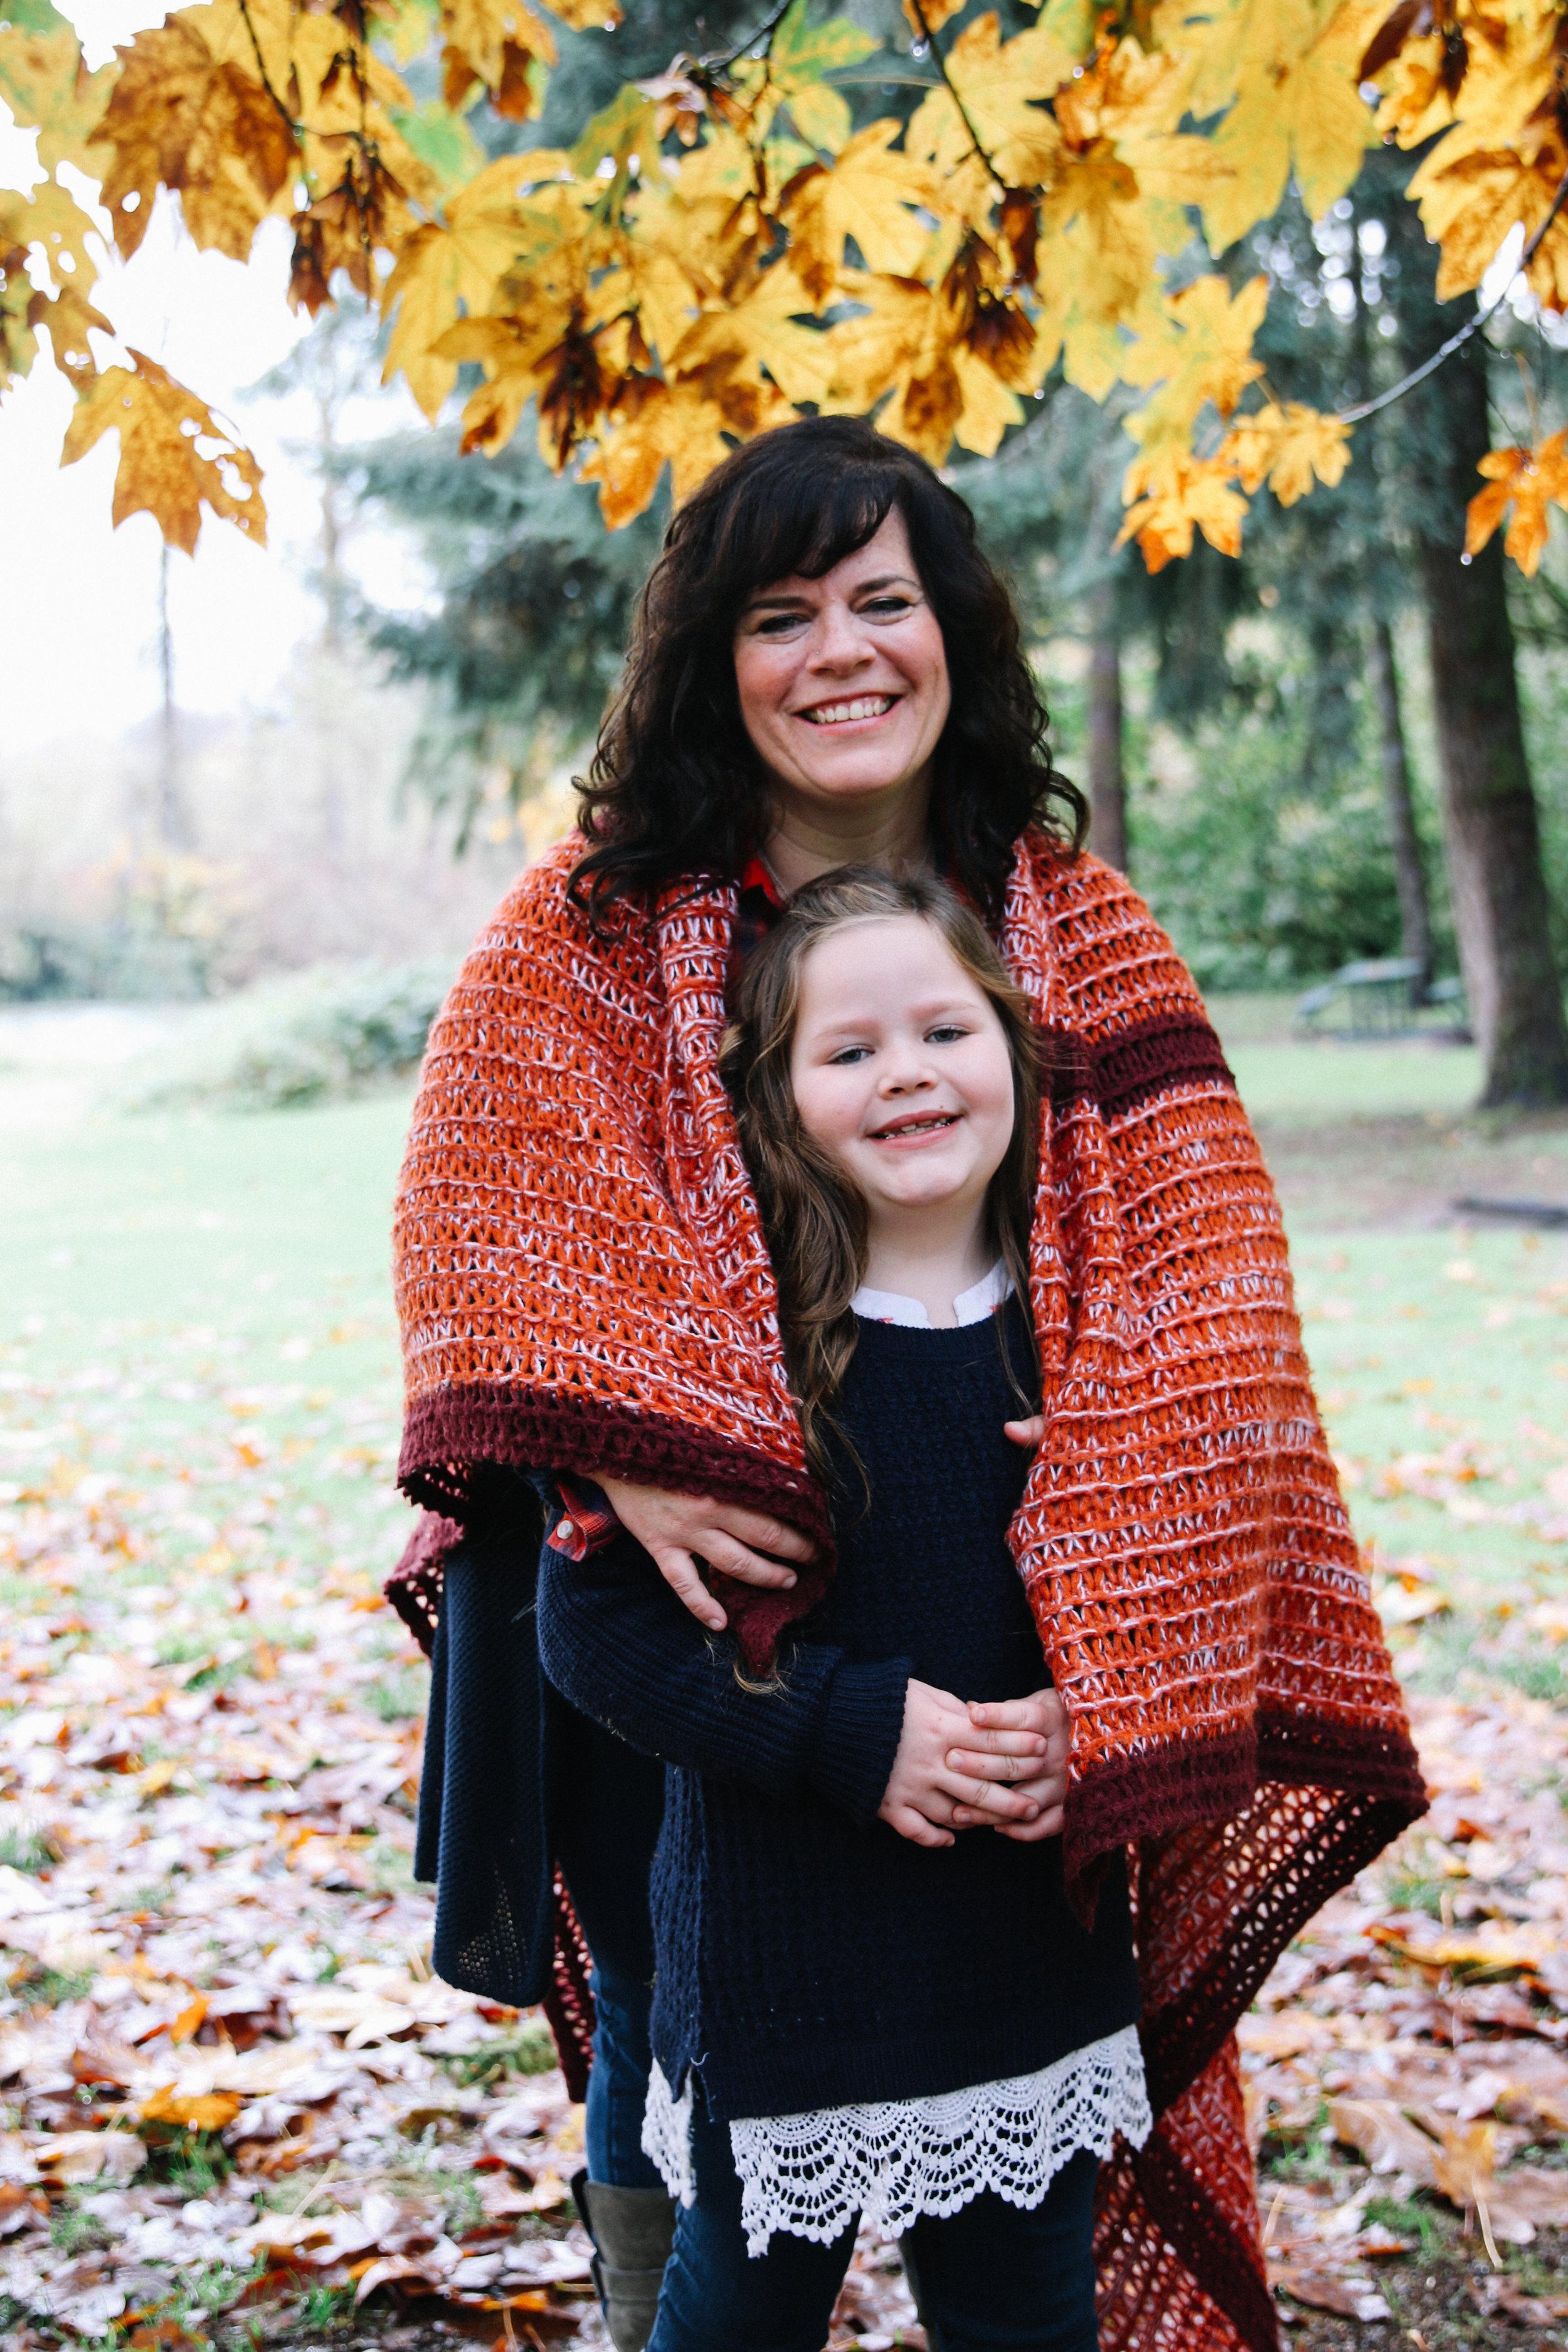 Lyndee+Marybella'16-48.jpg